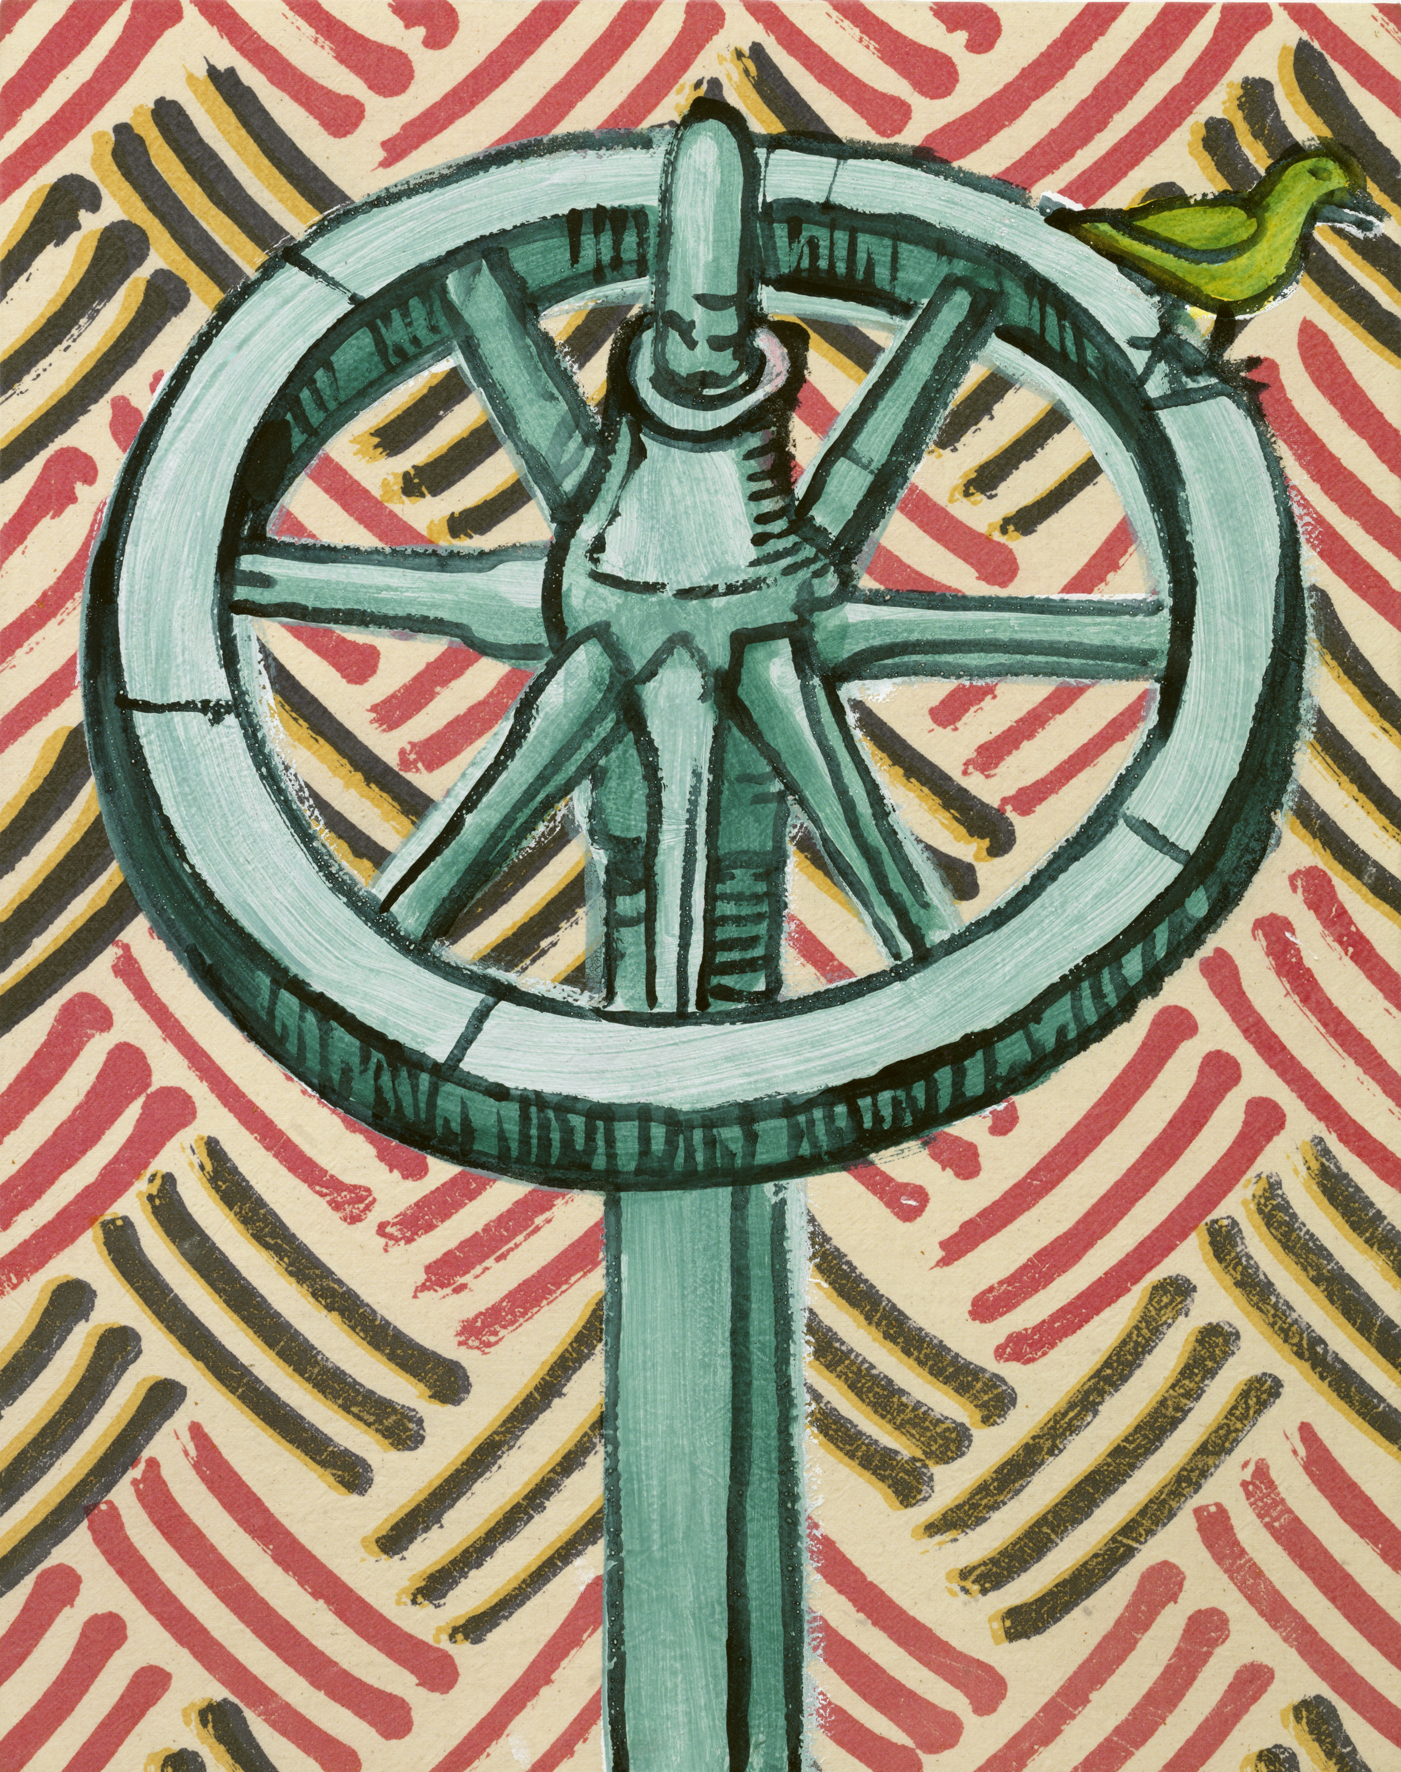 Instrument of Torture: Wheel, 2017